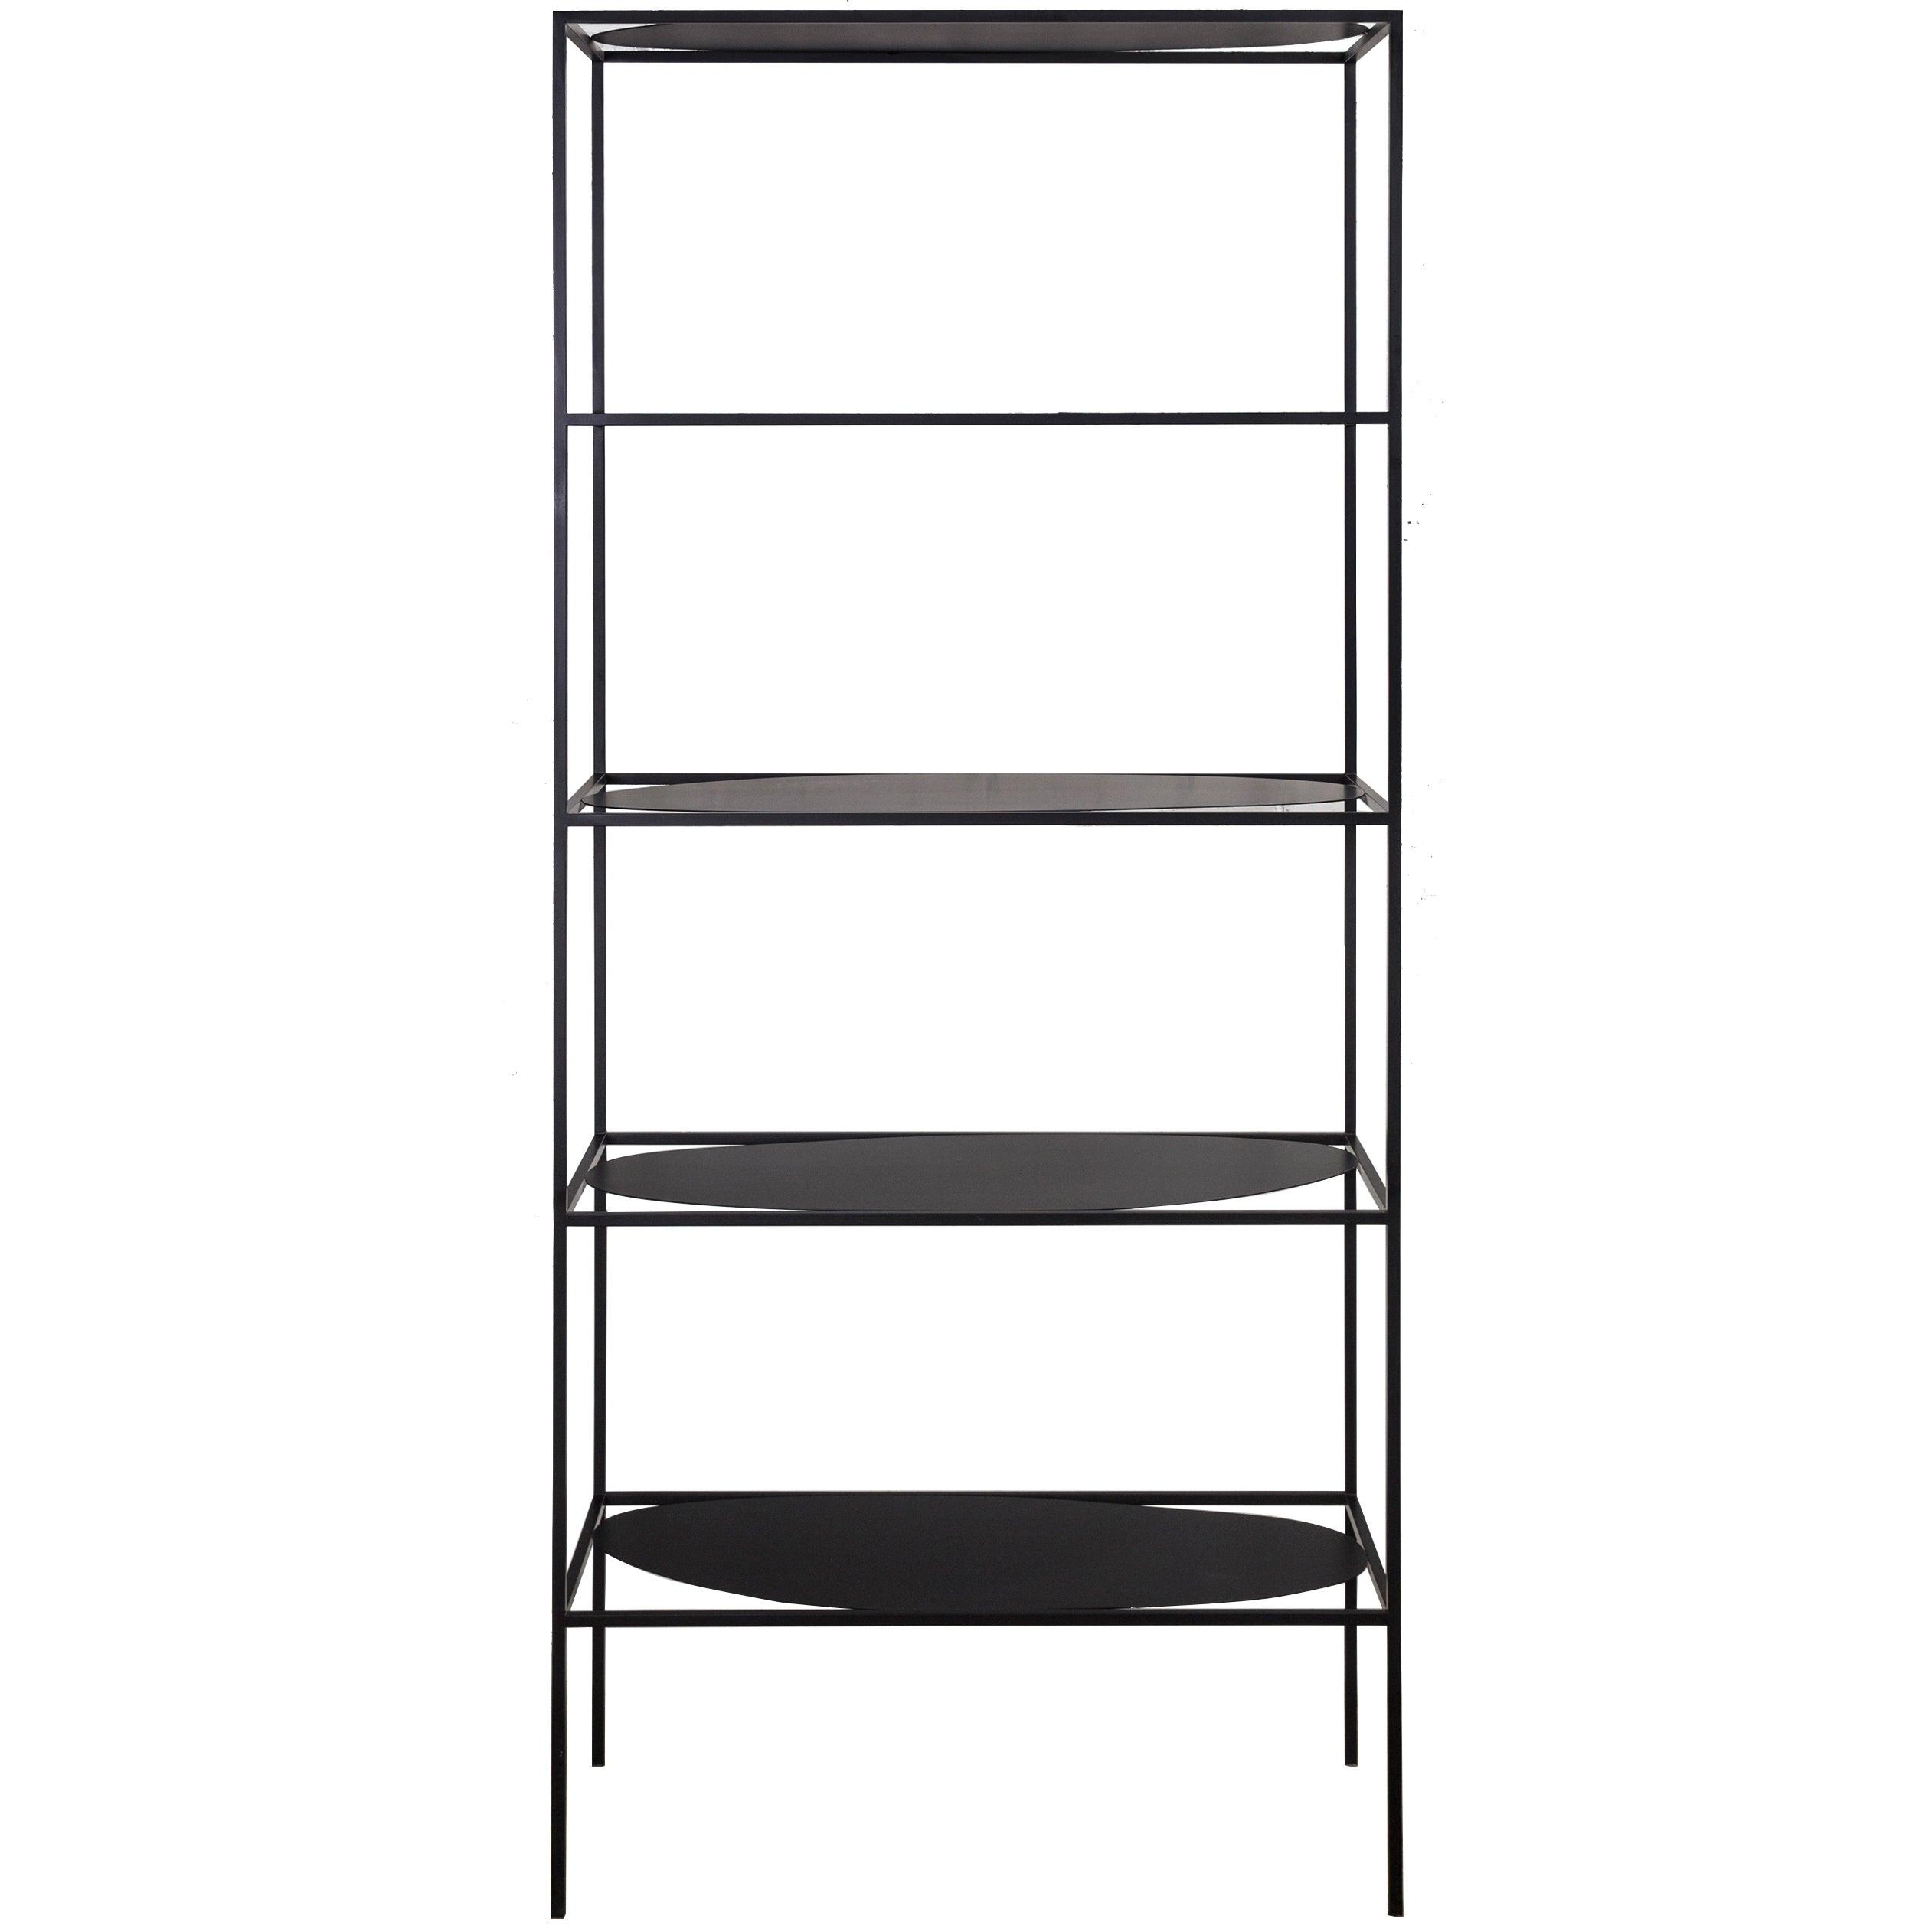 Contemporary Sculptural Black Steel Etagere Bookcase Storage Shelf USA